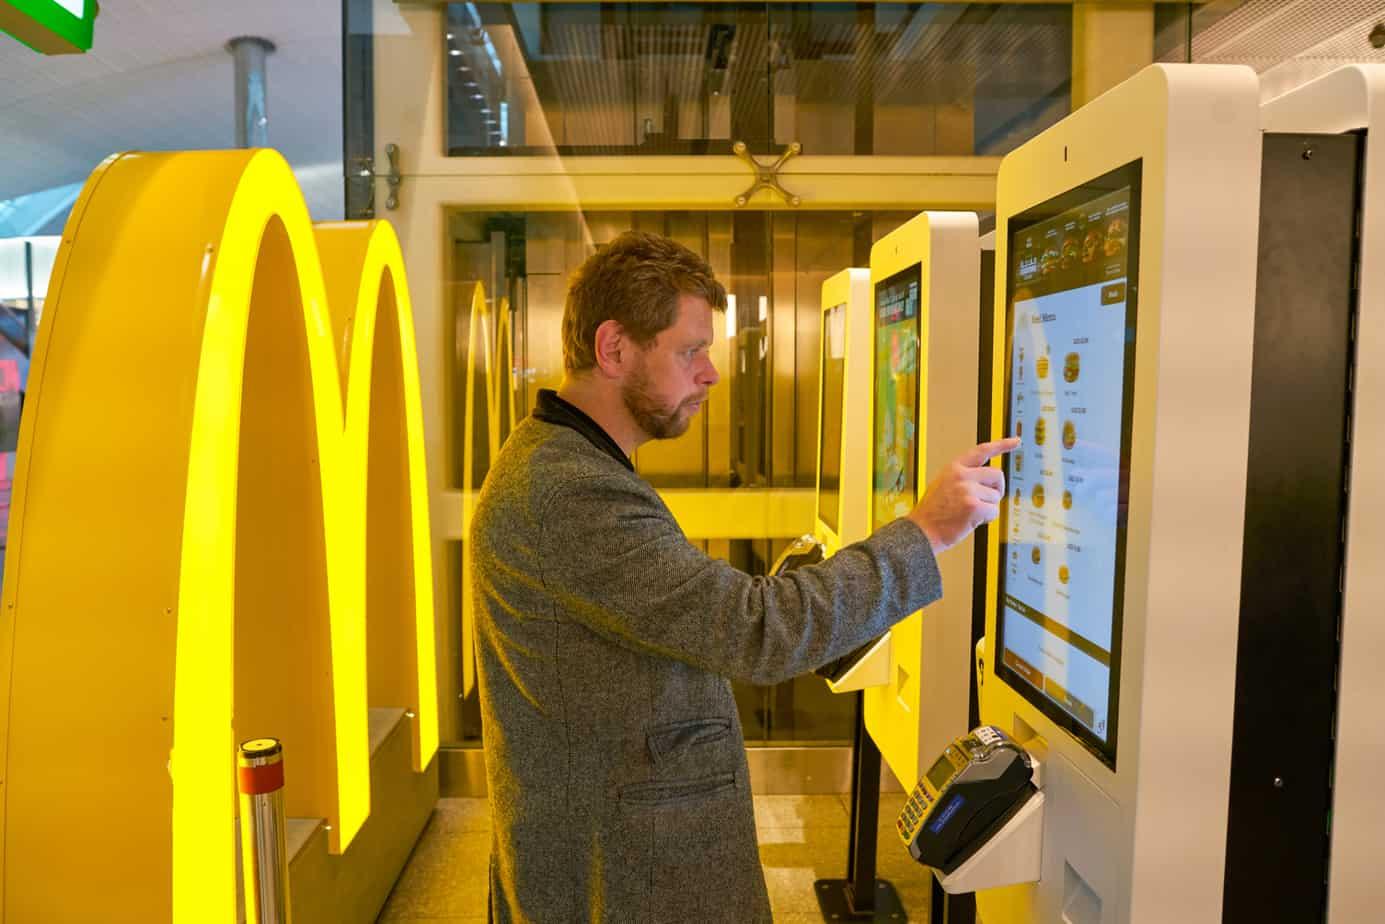 self ordering kiosks at mcdonalds 157443259